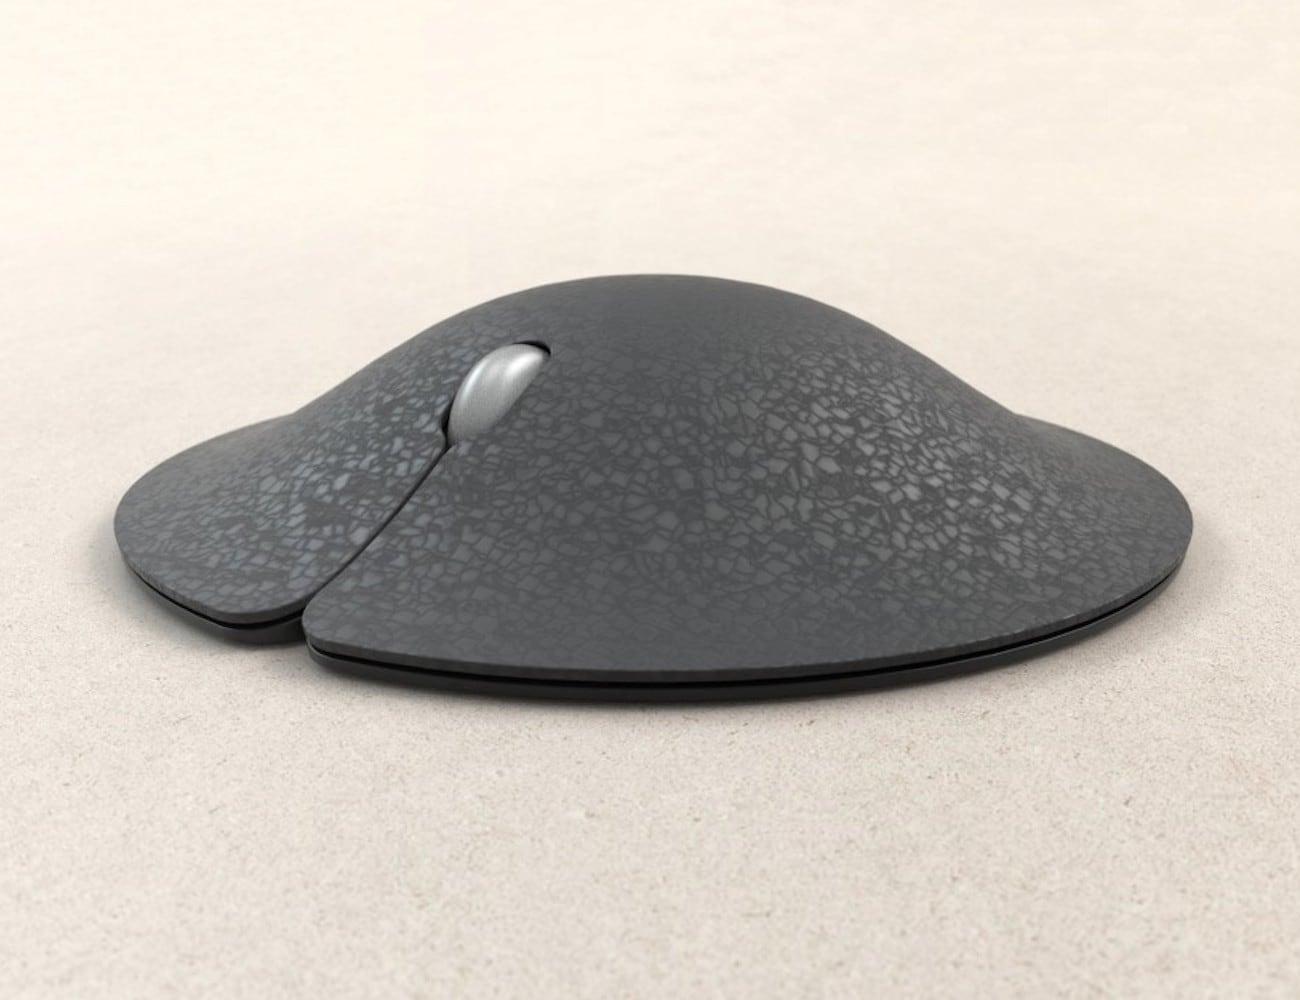 Manta Mouse Conceptual Ergonomic Mouse has an integrated mousepad